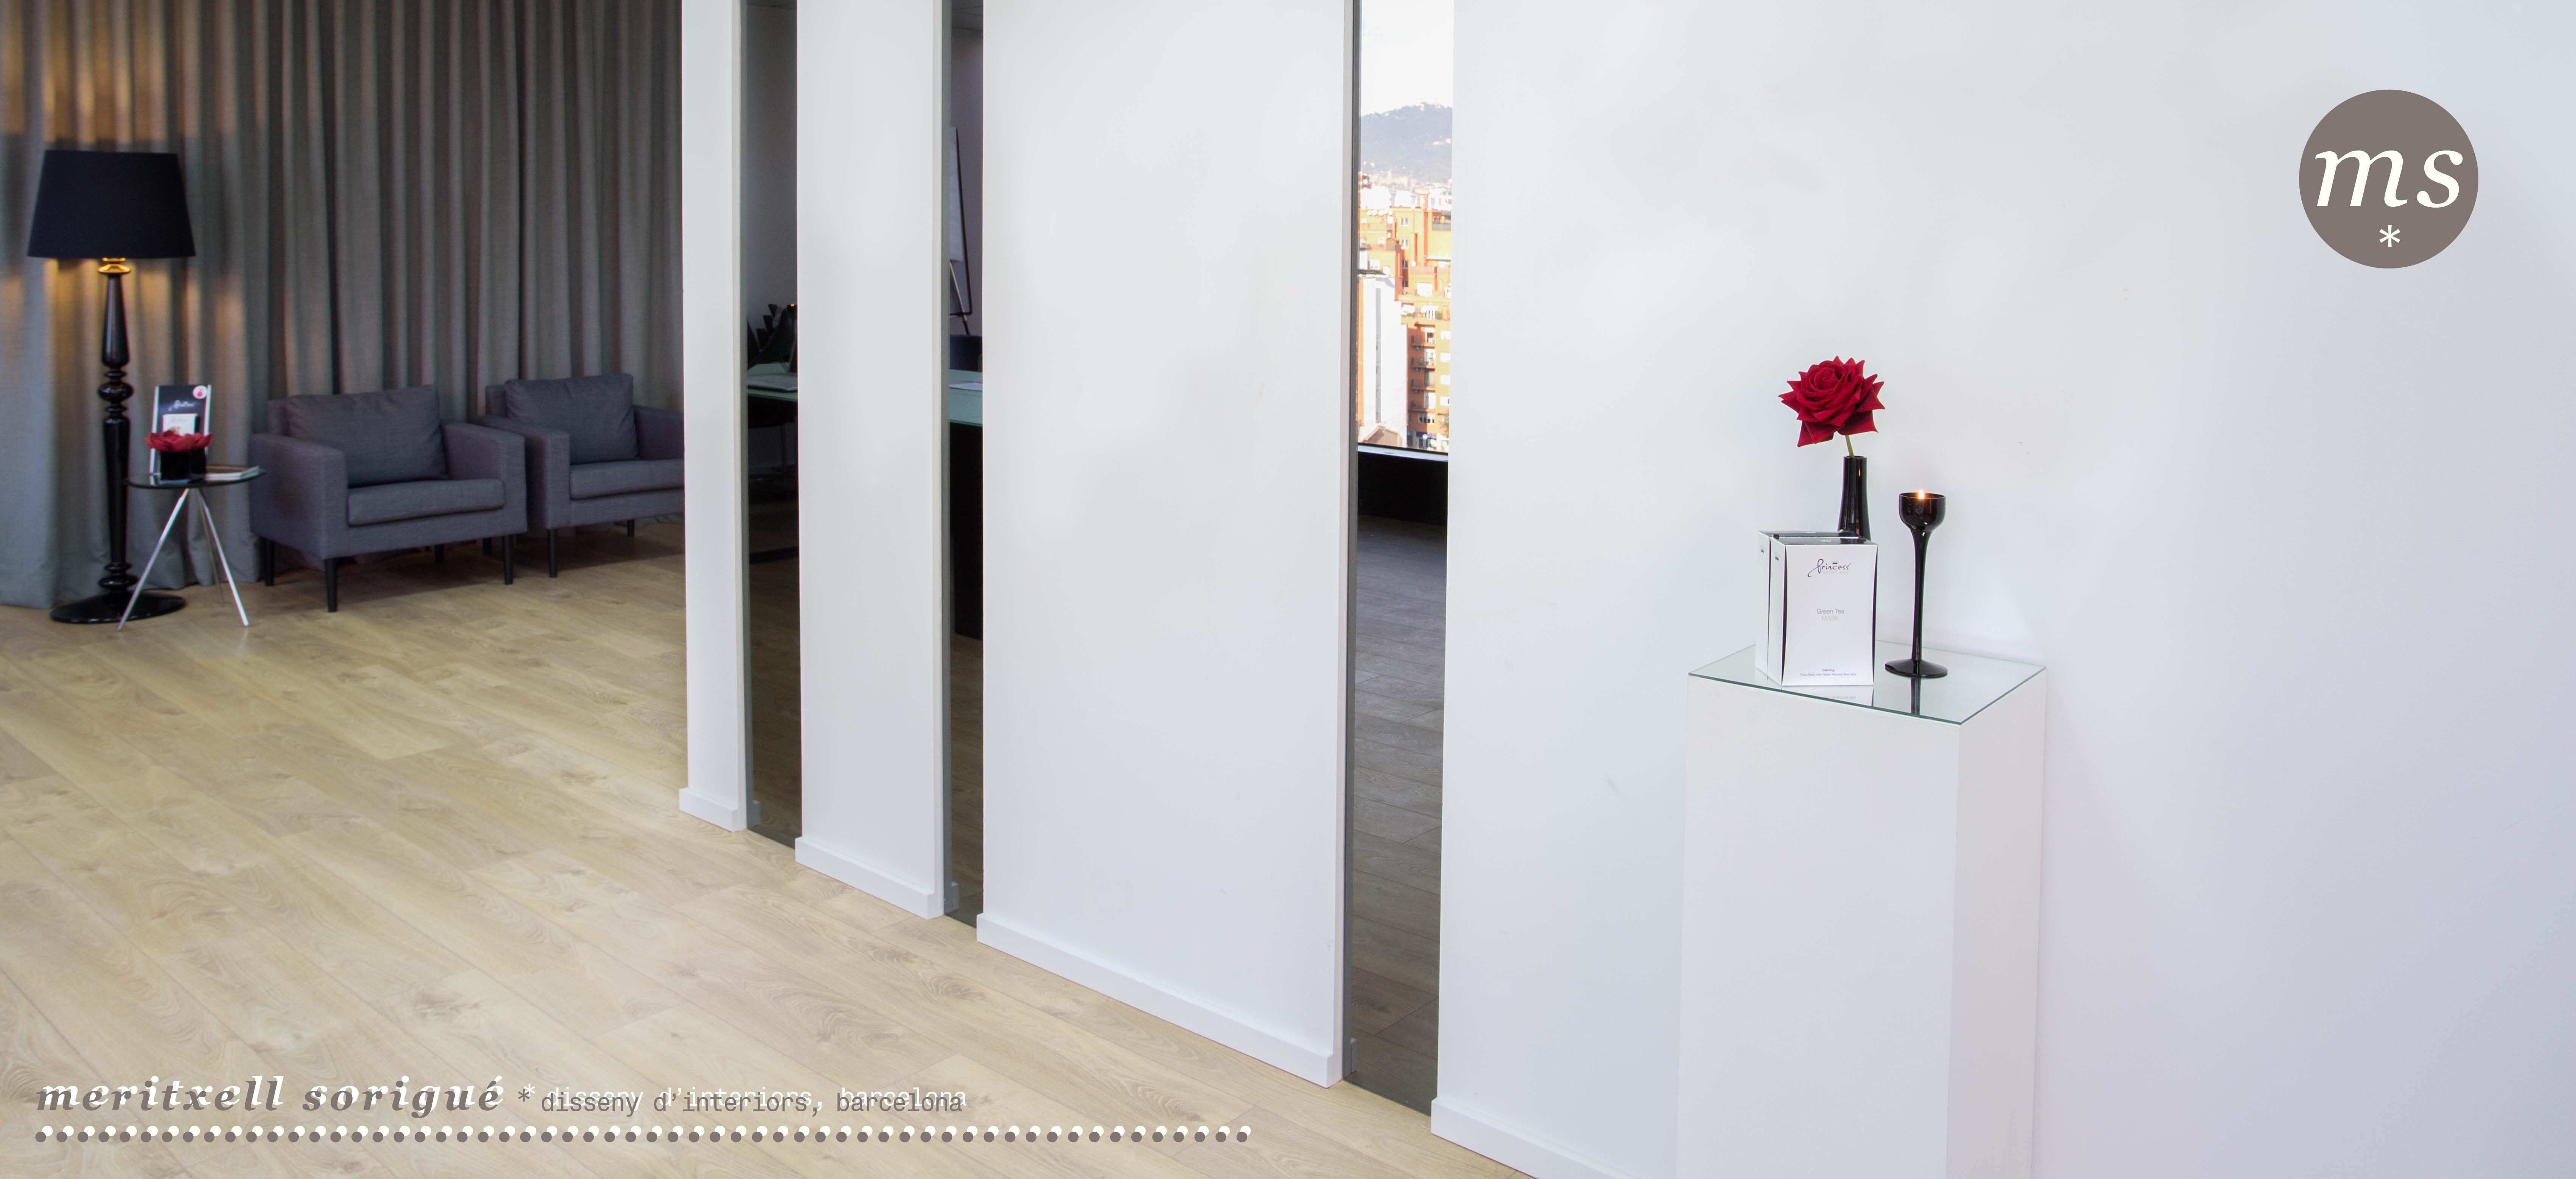 www.txellsorigue.com @txellsorigué  #designer #interiordesign  #barcelona #interiors #dissenyinteriors #disseny #barcelonadesign #diseño #diseñointeriores #interiordesign #interiorismo #decoracion #interiordesignproject #lifeexplorer #beautyhunter #interiordesigner